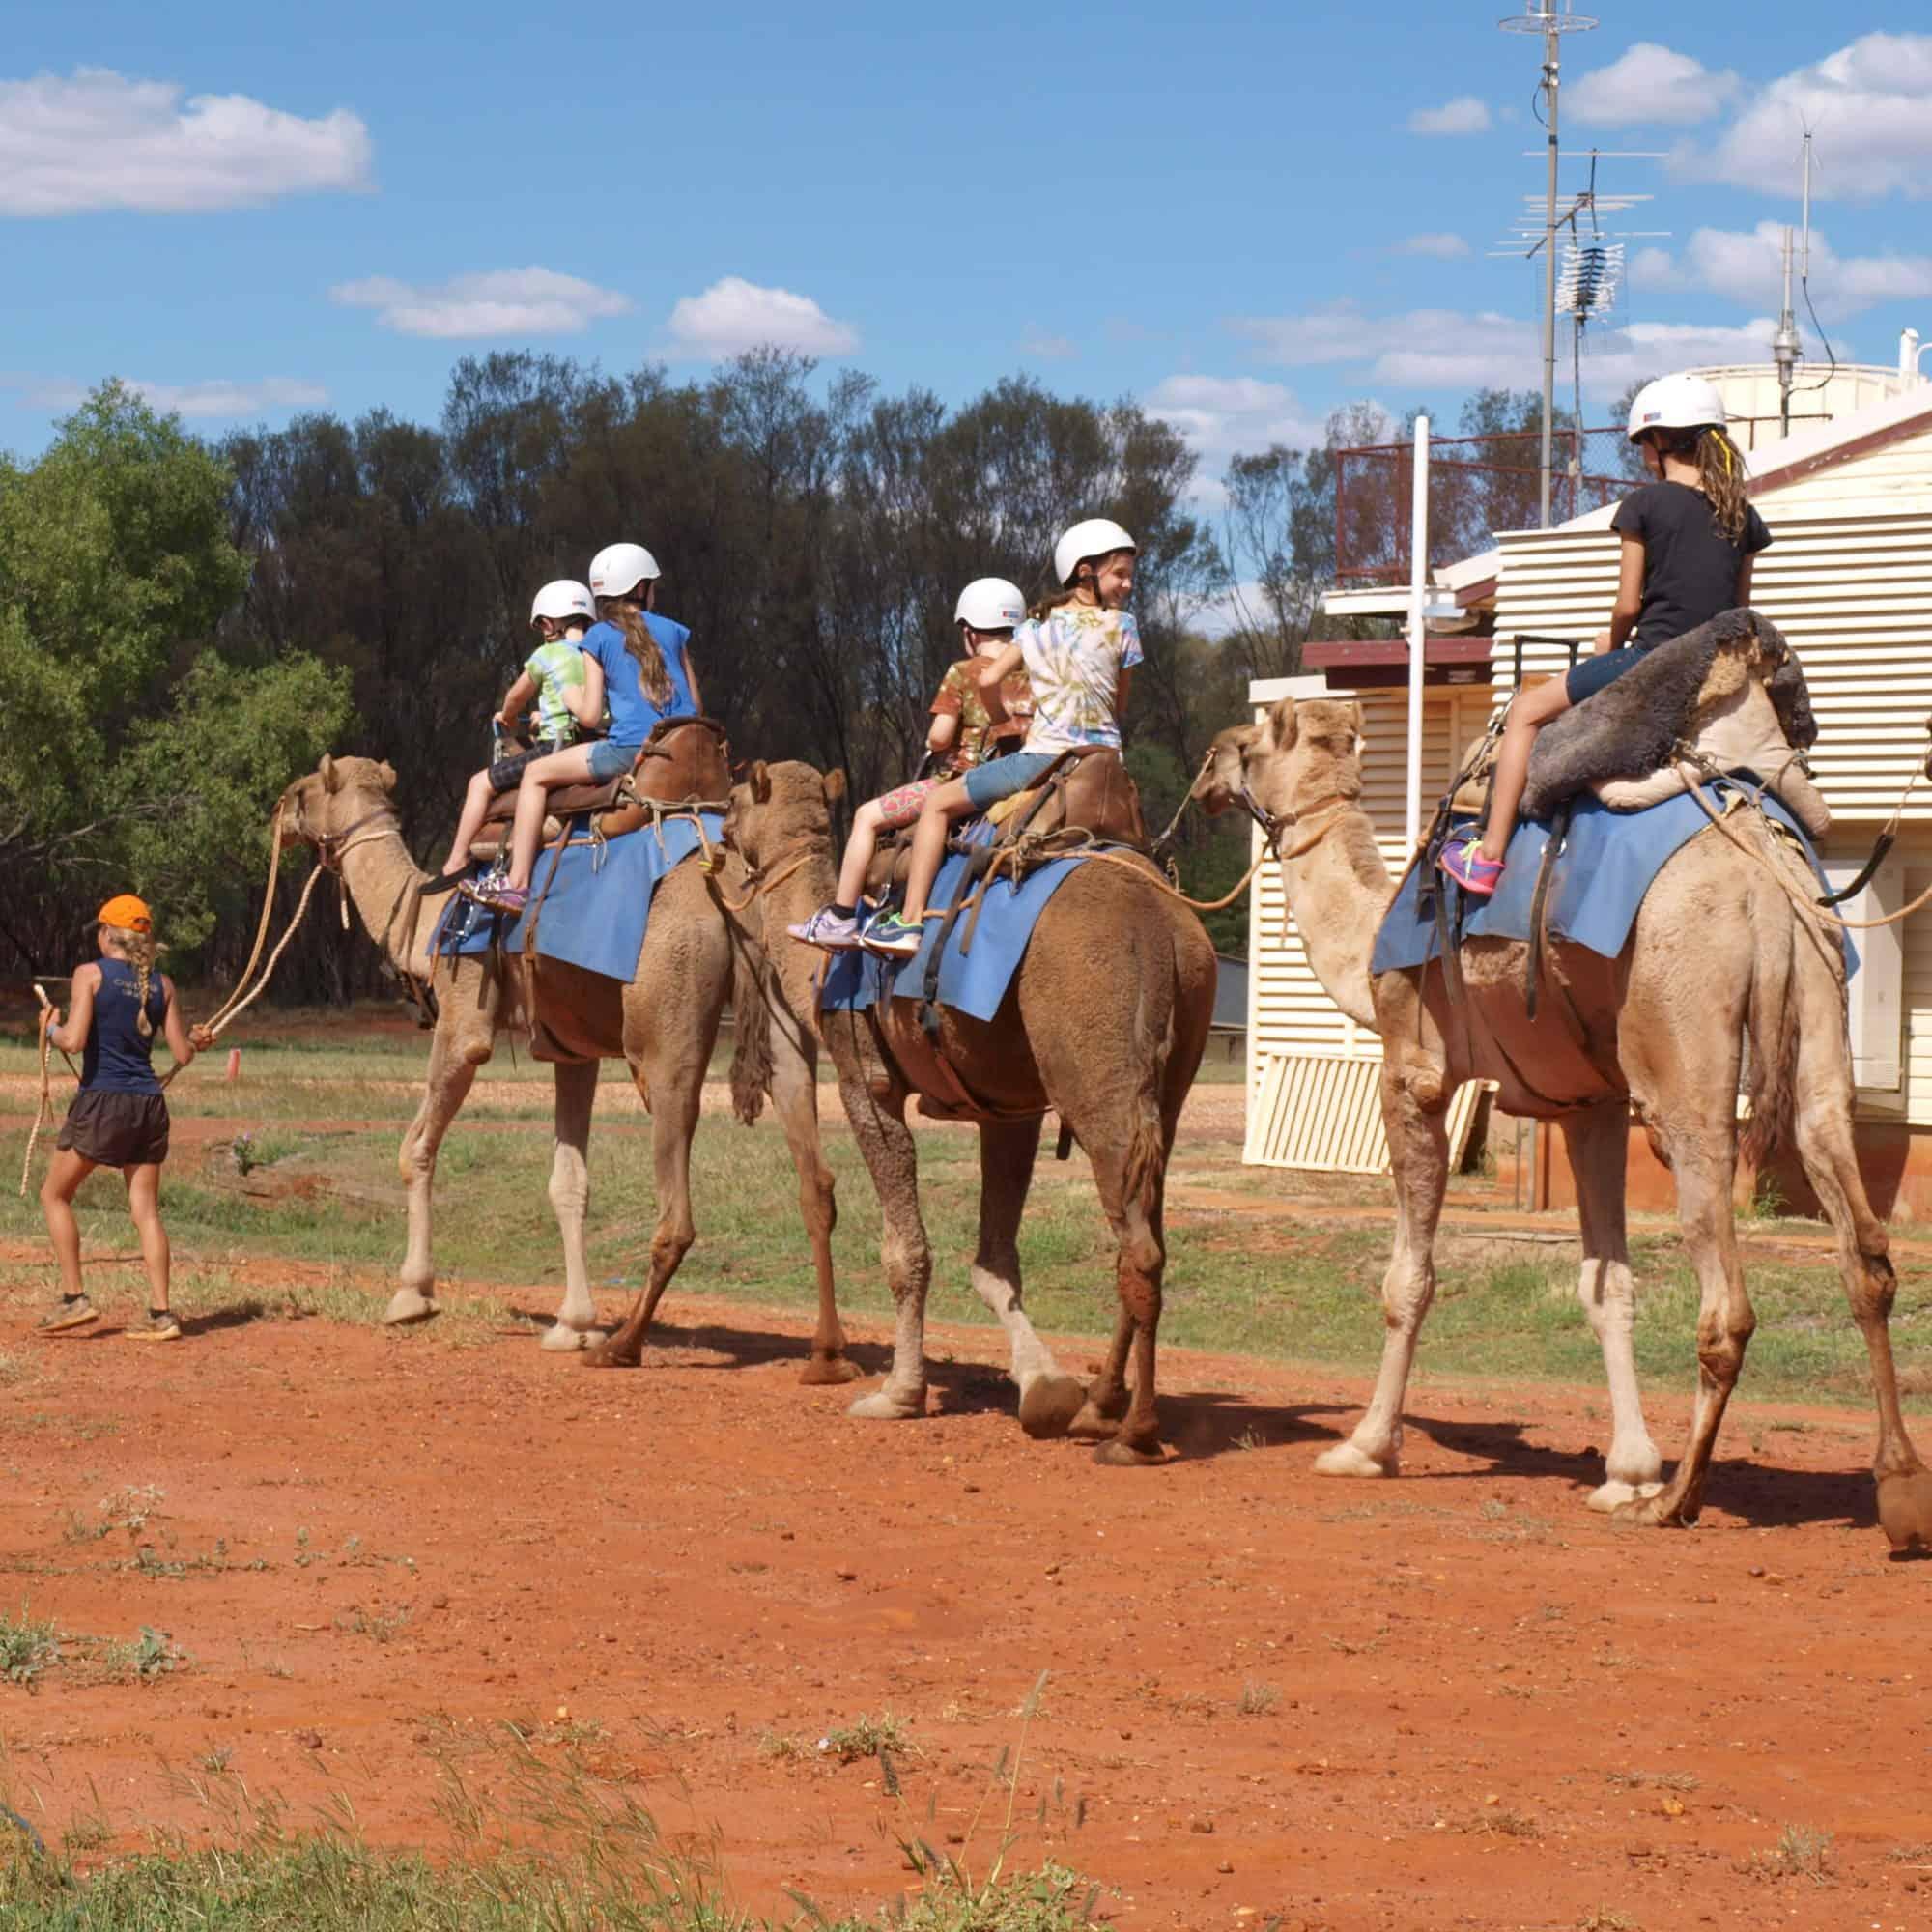 Camel rides in Charleville